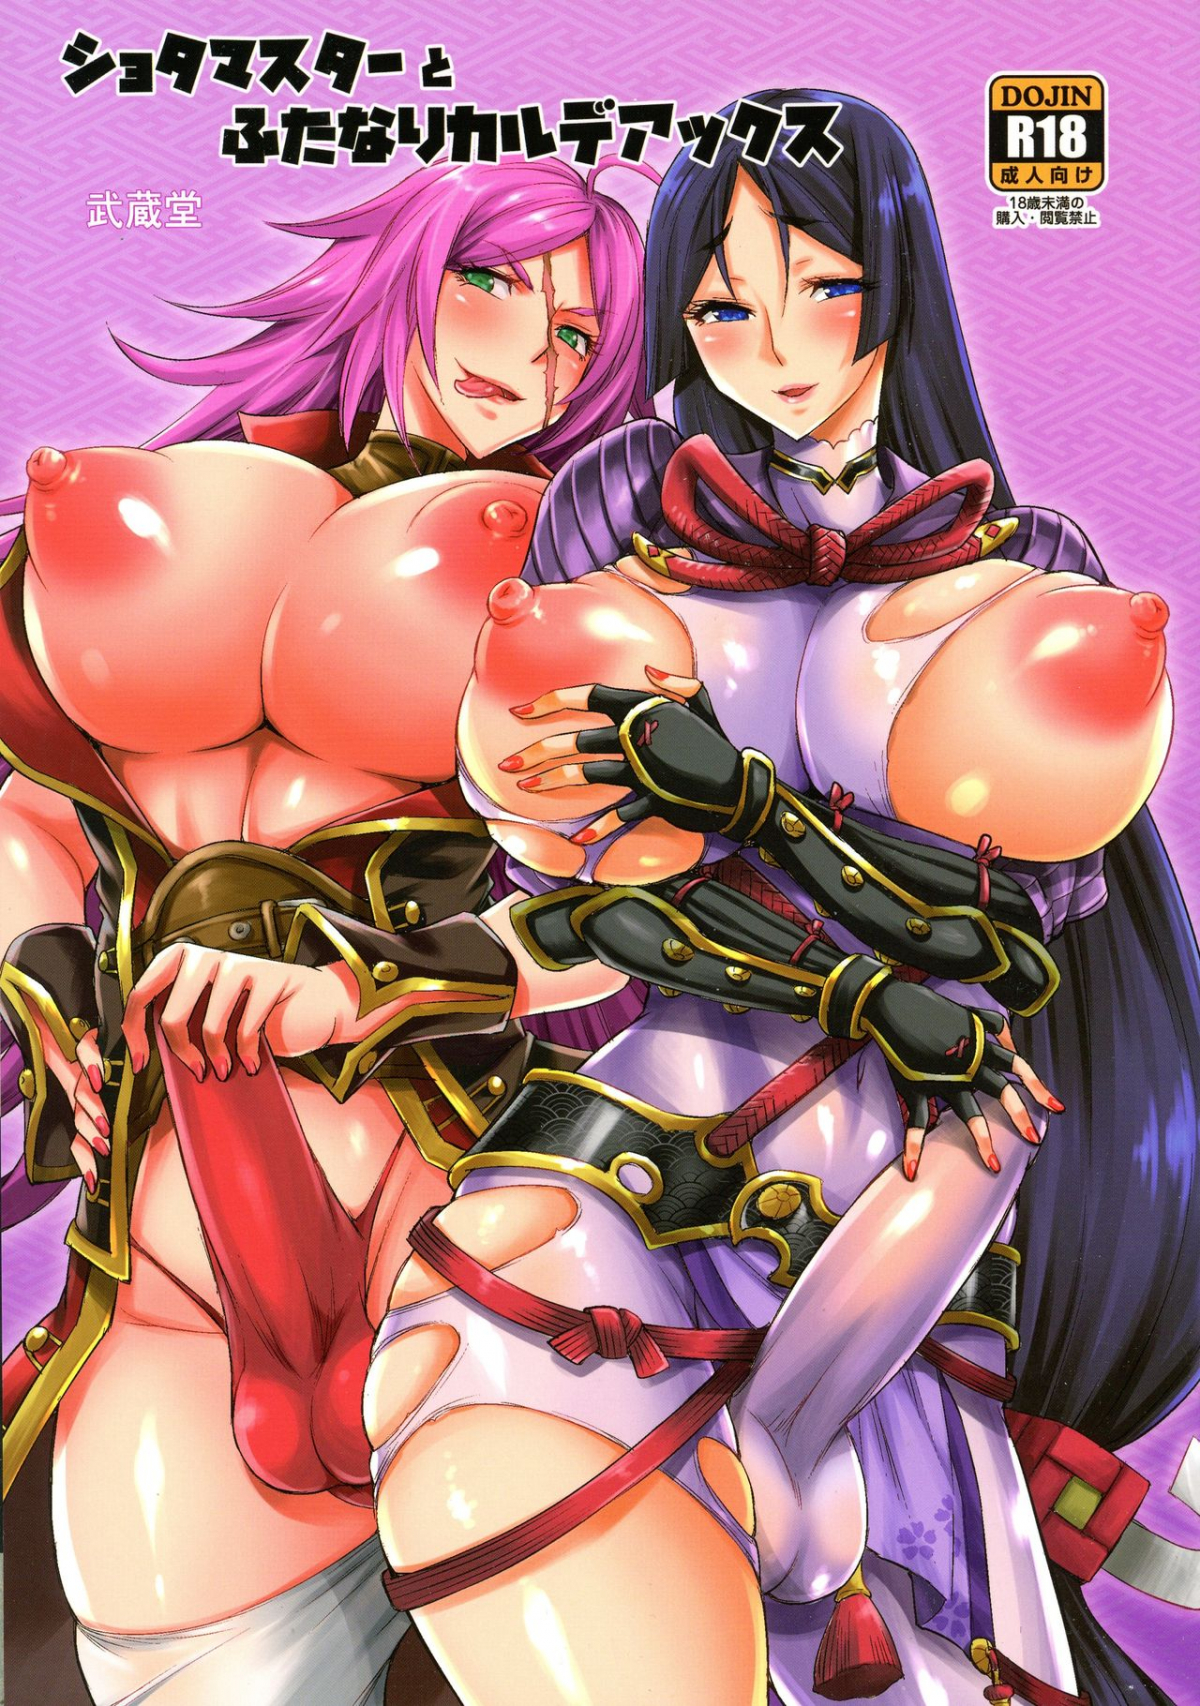 Hình ảnh  trong bài viết Truyện hentai Shota Master to Futanari Chaldeax